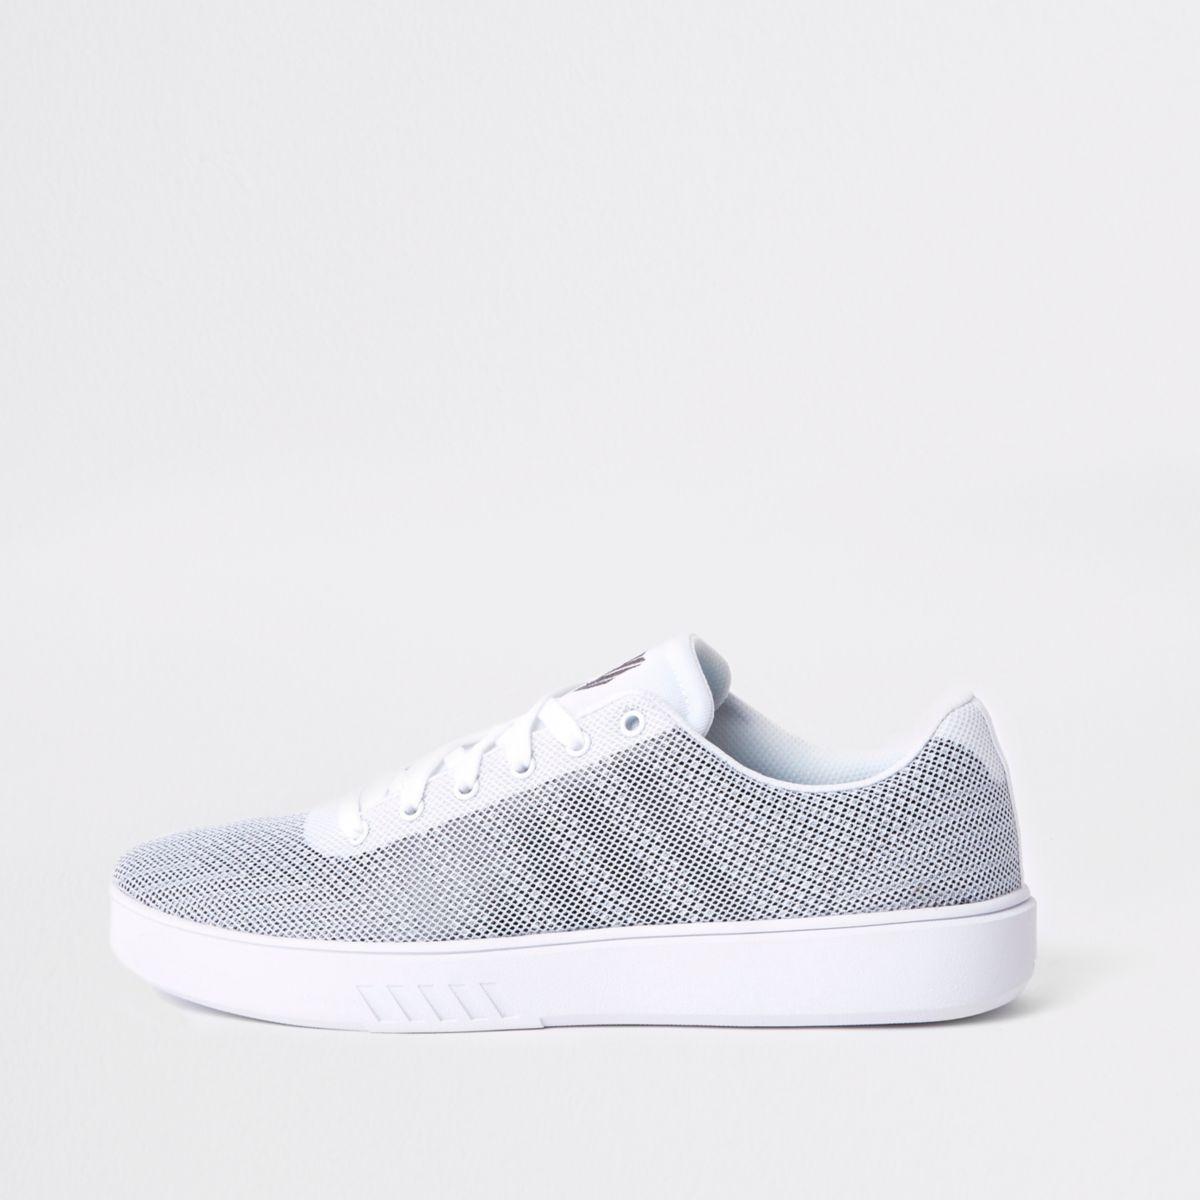 K-Swiss white mesh sneakers